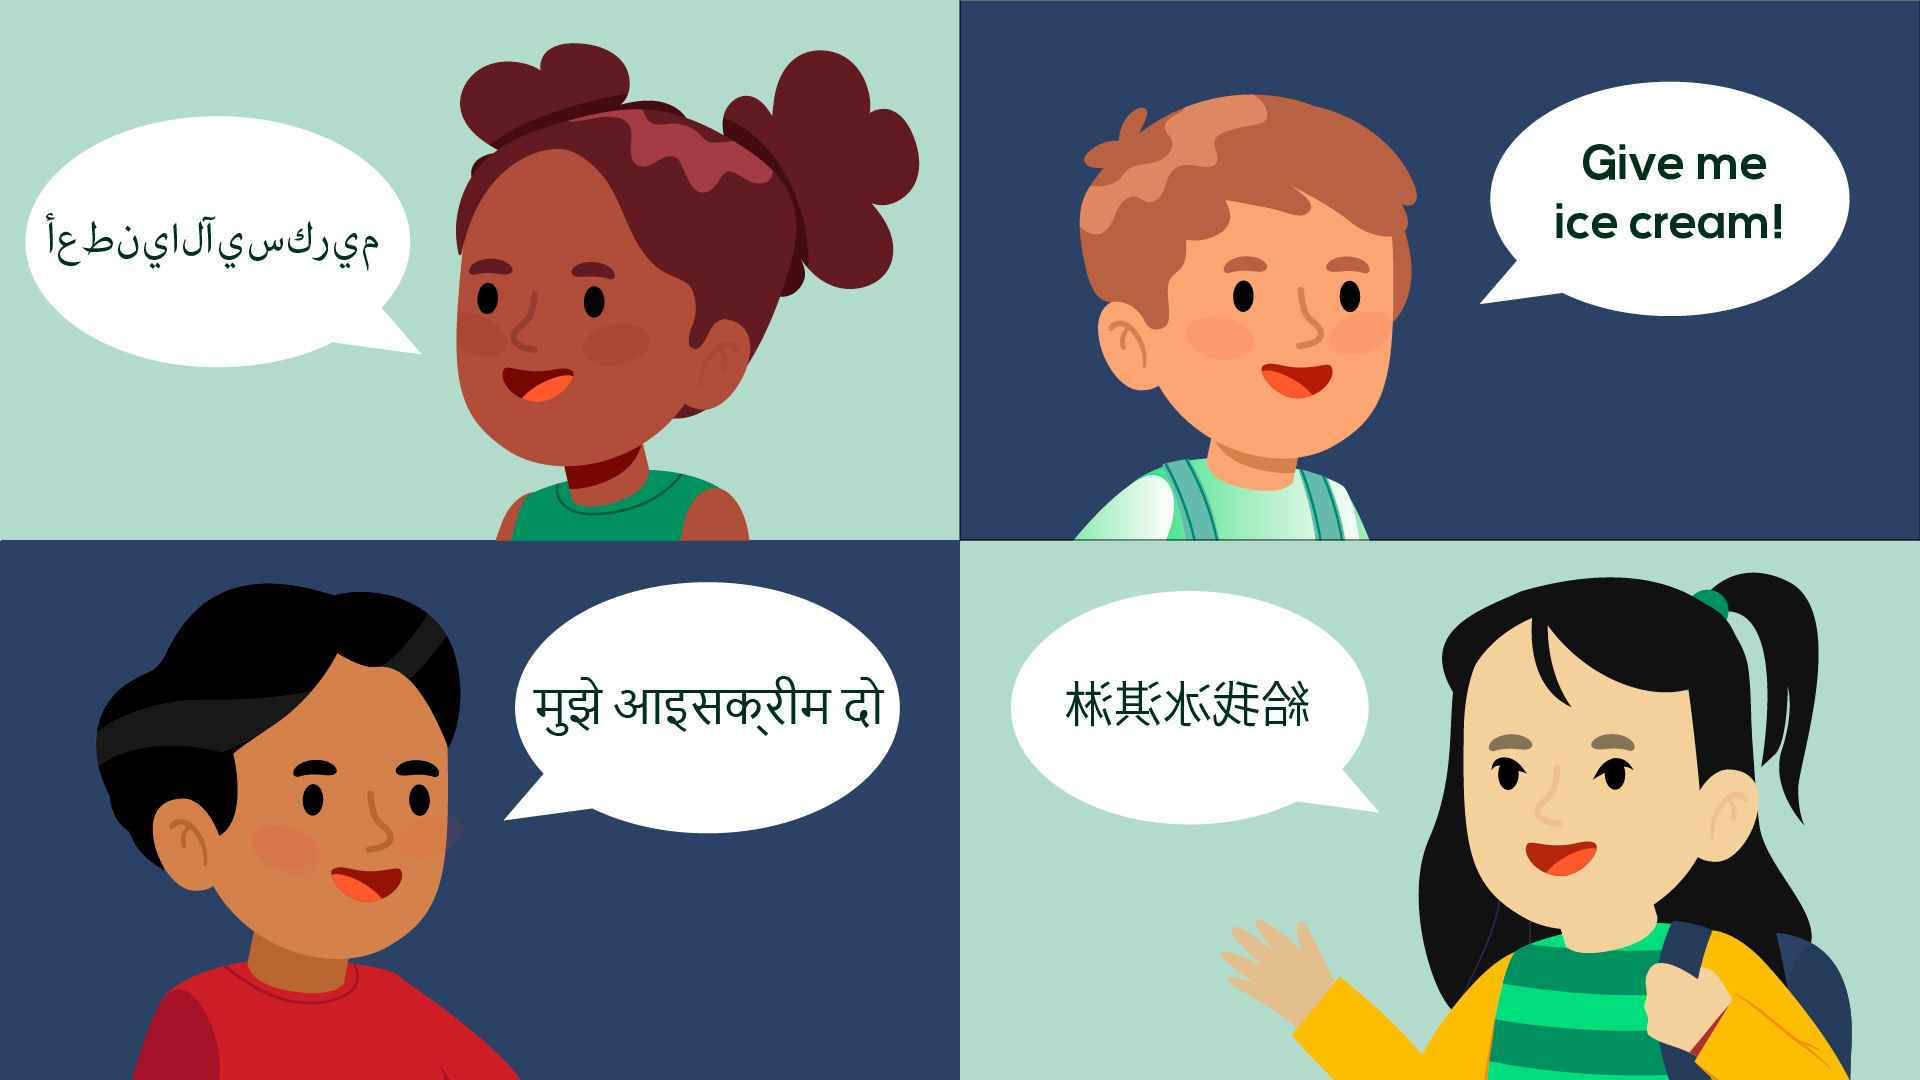 Children talk in the Animated Explainer Video